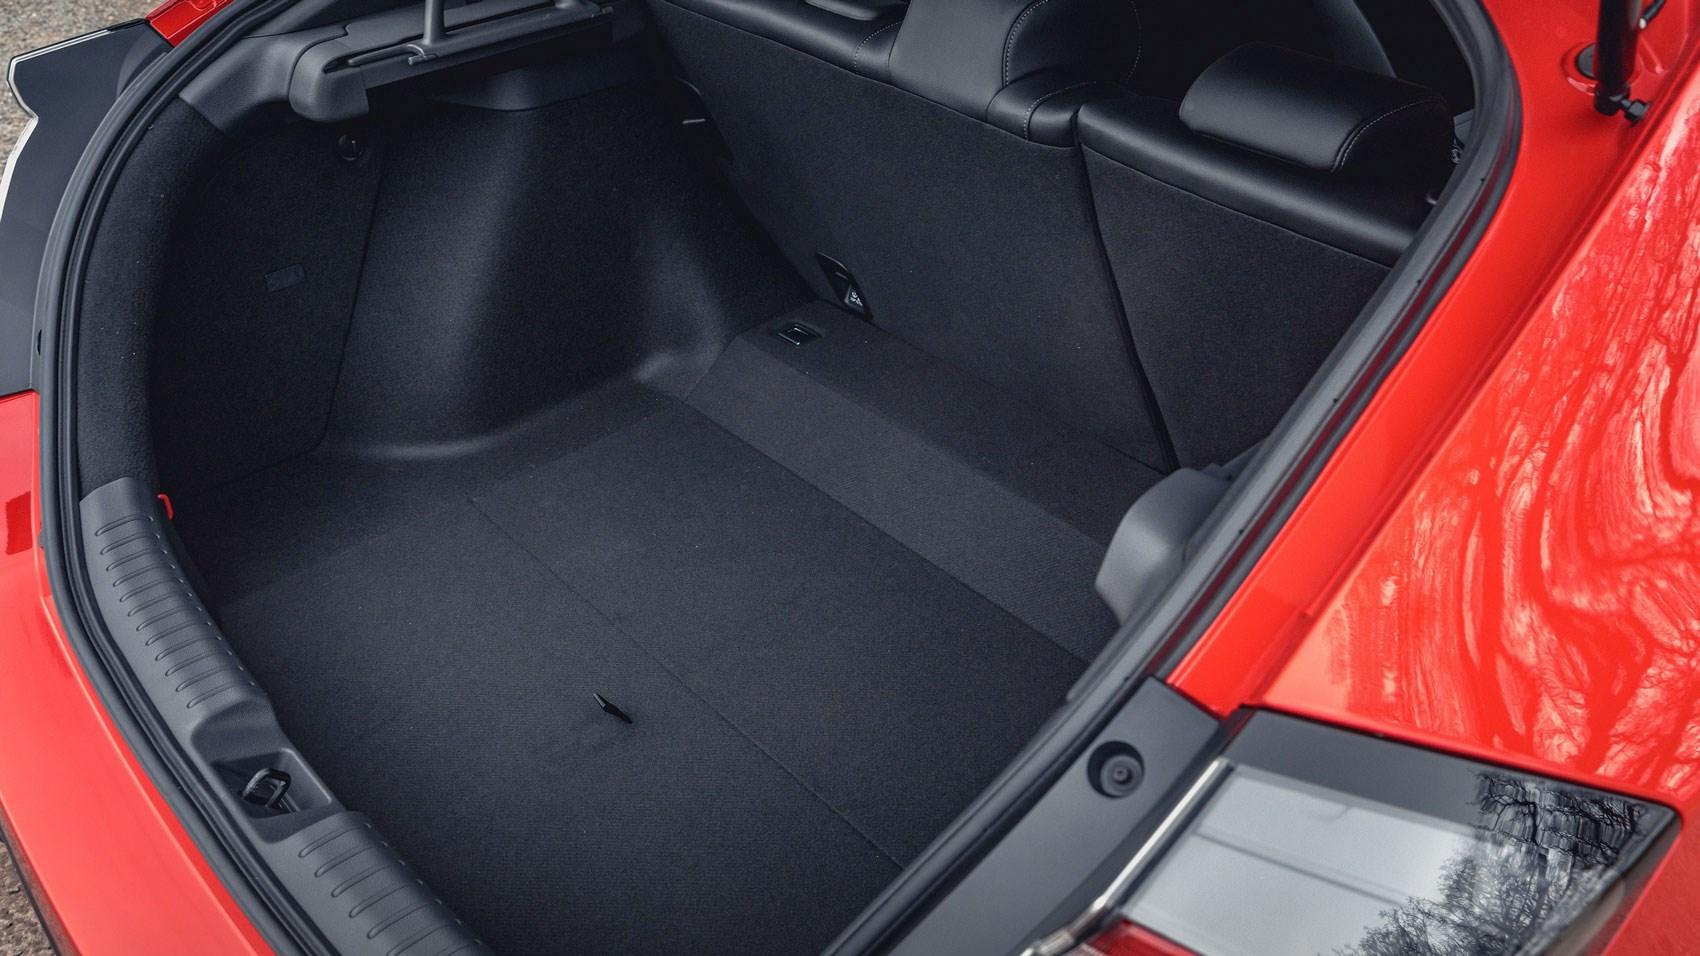 Honda Civic 10 Vtec Turbo Ex Manual 2018 Review Car Magazine Wiring Diagram For Alfa Romeo 156 Boot